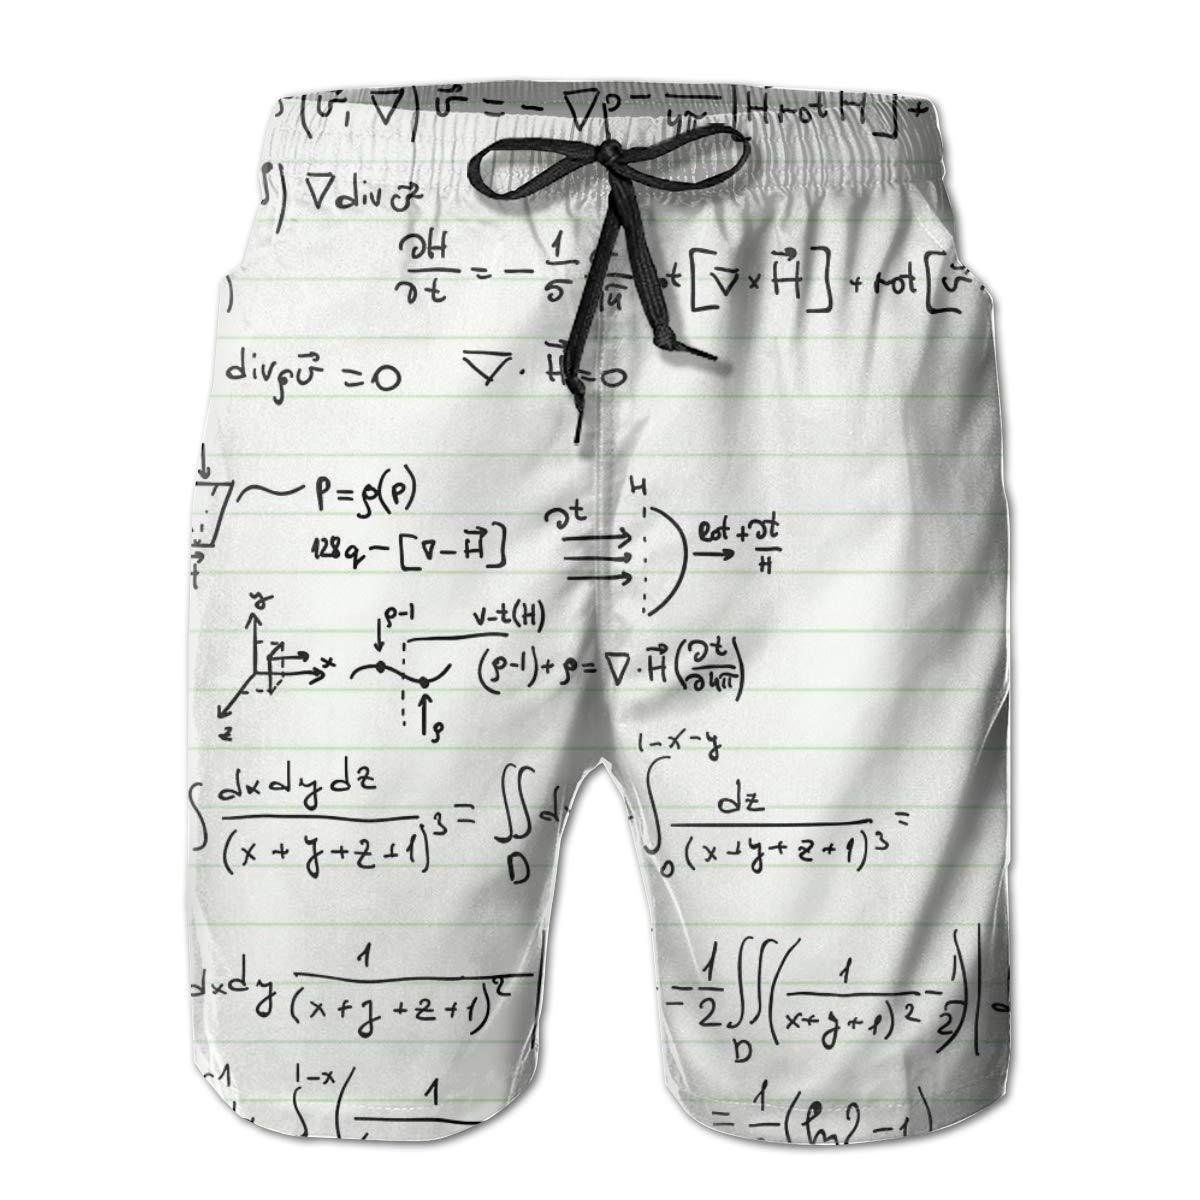 SARA NELL Mens Swim Trunks Pattern with Mathematical Formulas White Surfing Beach Board Shorts Swimwear